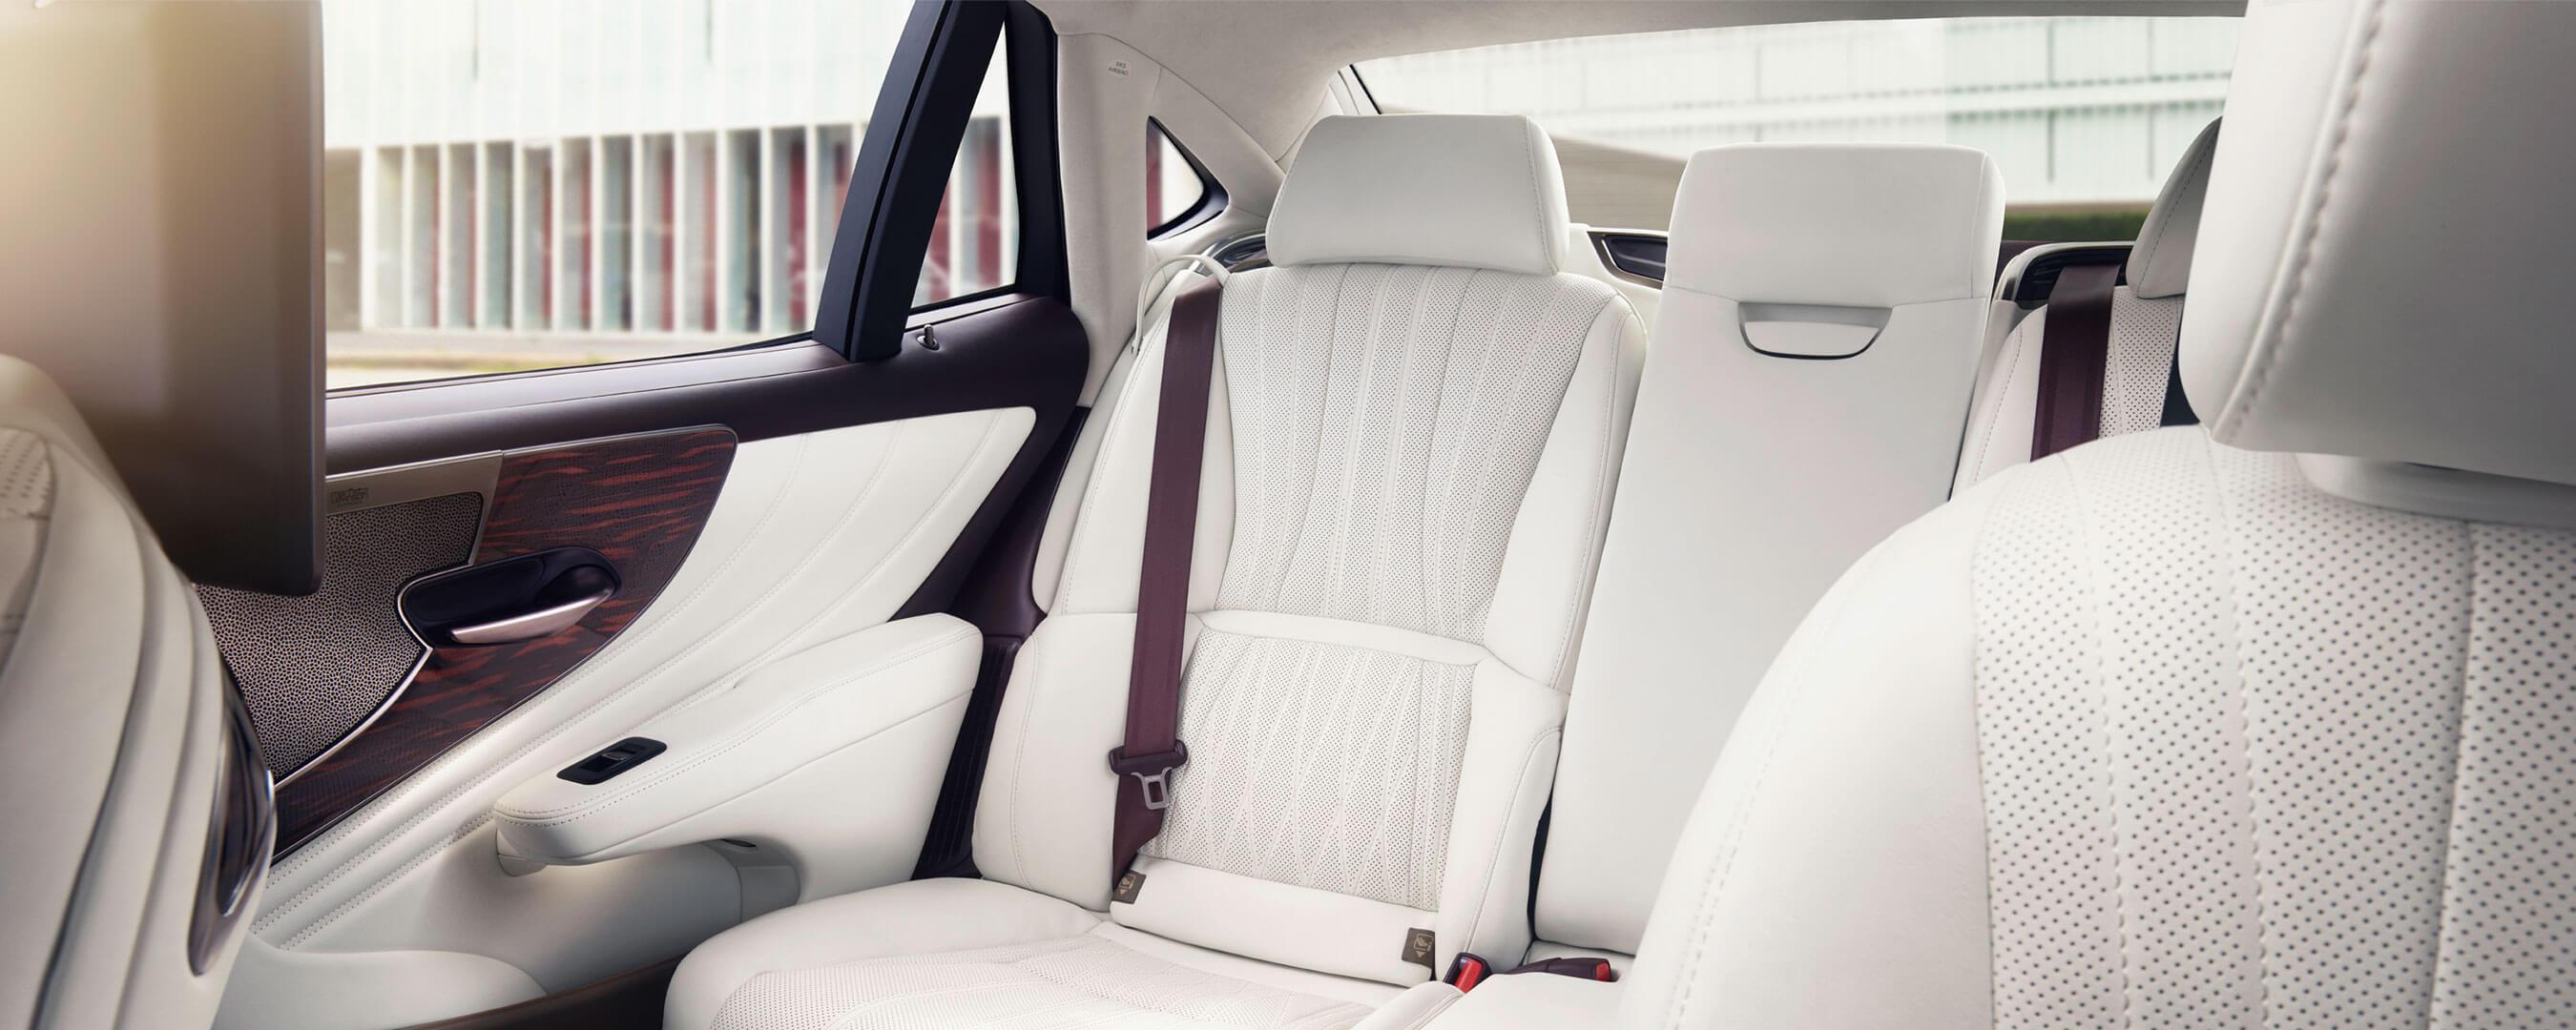 2021 lexus ls experience interior rear